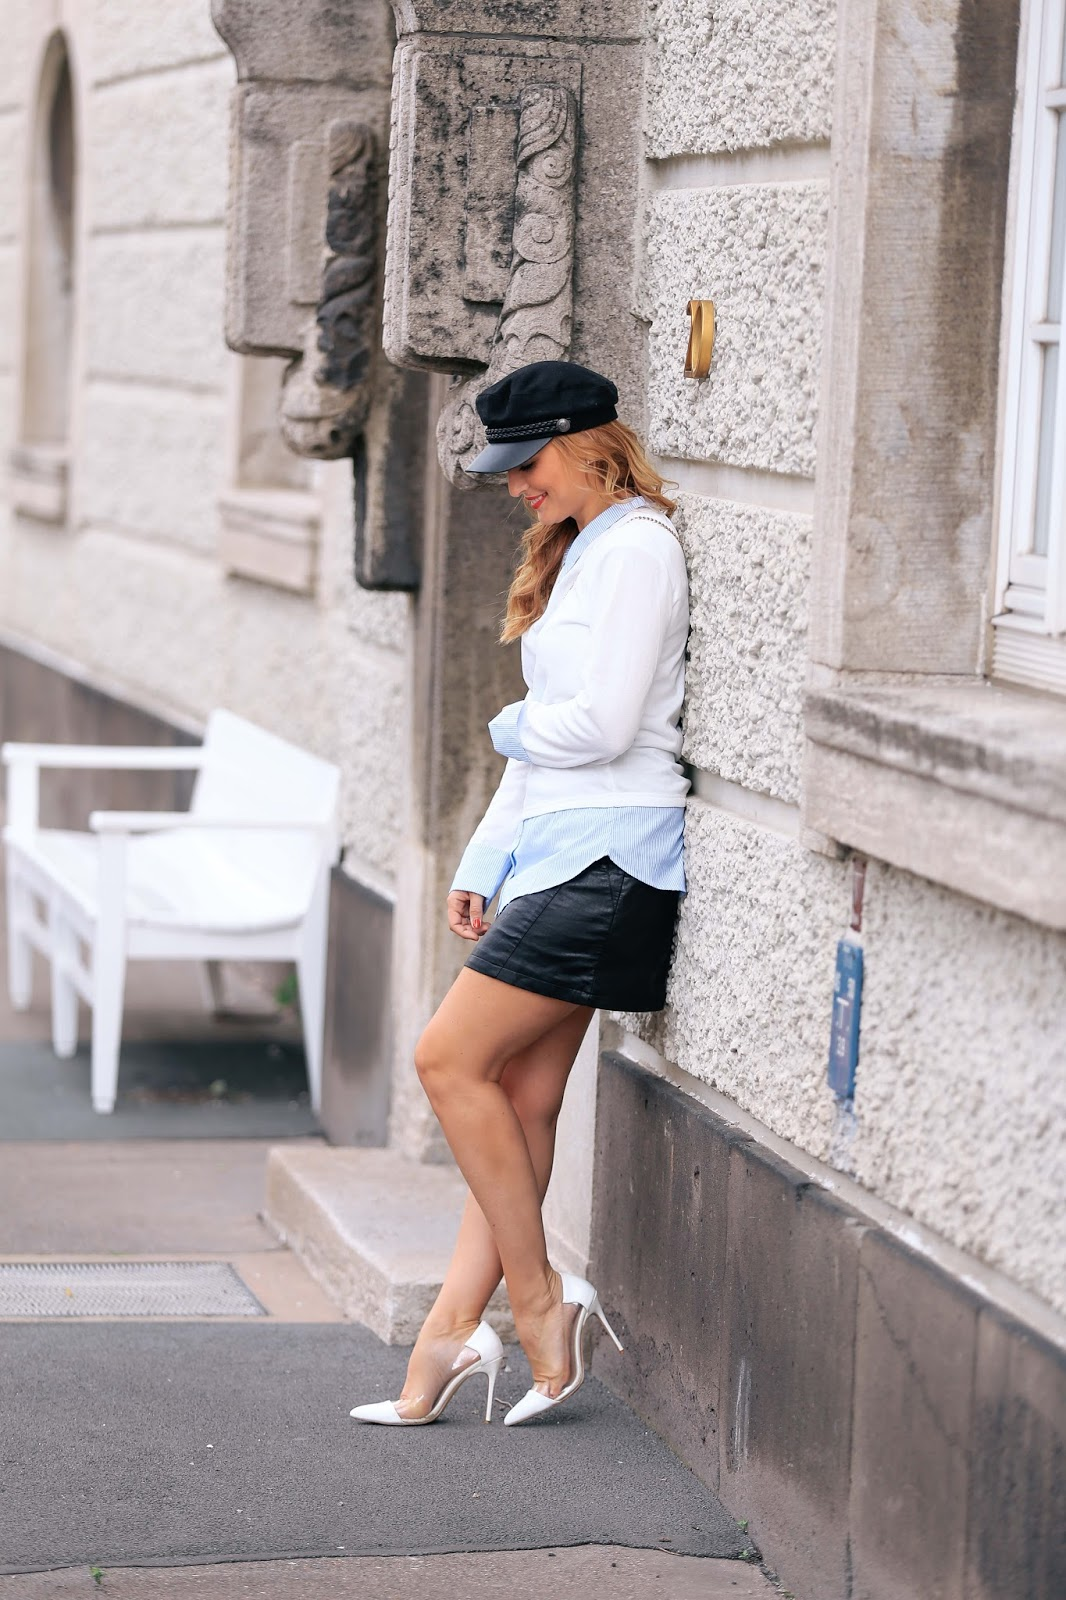 Paris-pariser-look-lederrock-matrosen-hut-bloggerstyle-german-fashionblogger